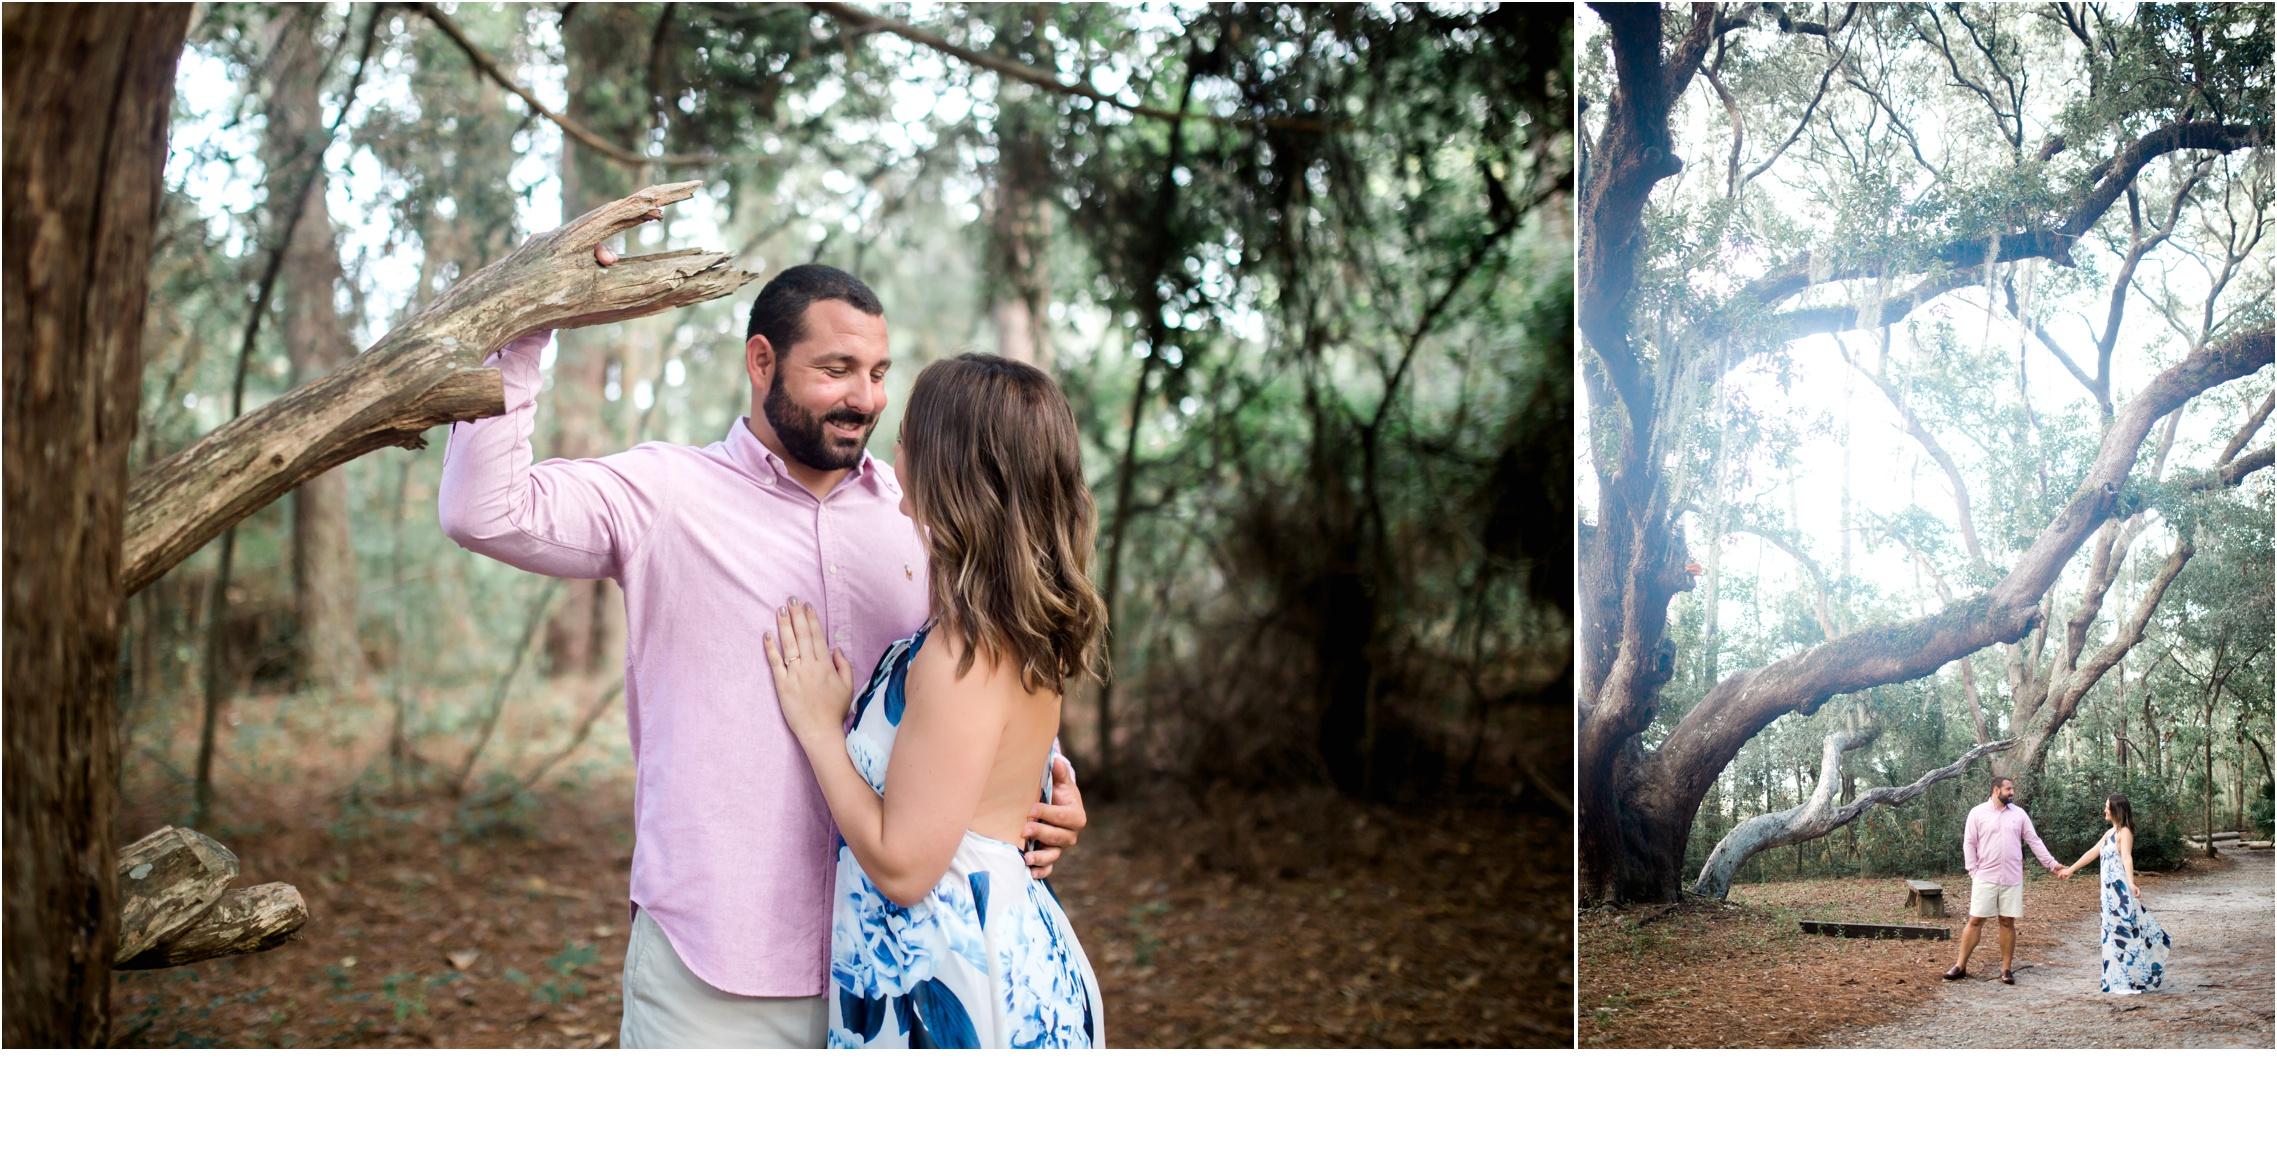 Rainey_Gregg_Photography_St._Simons_Island_Georgia_California_Wedding_Portrait_Photography_0138.jpg